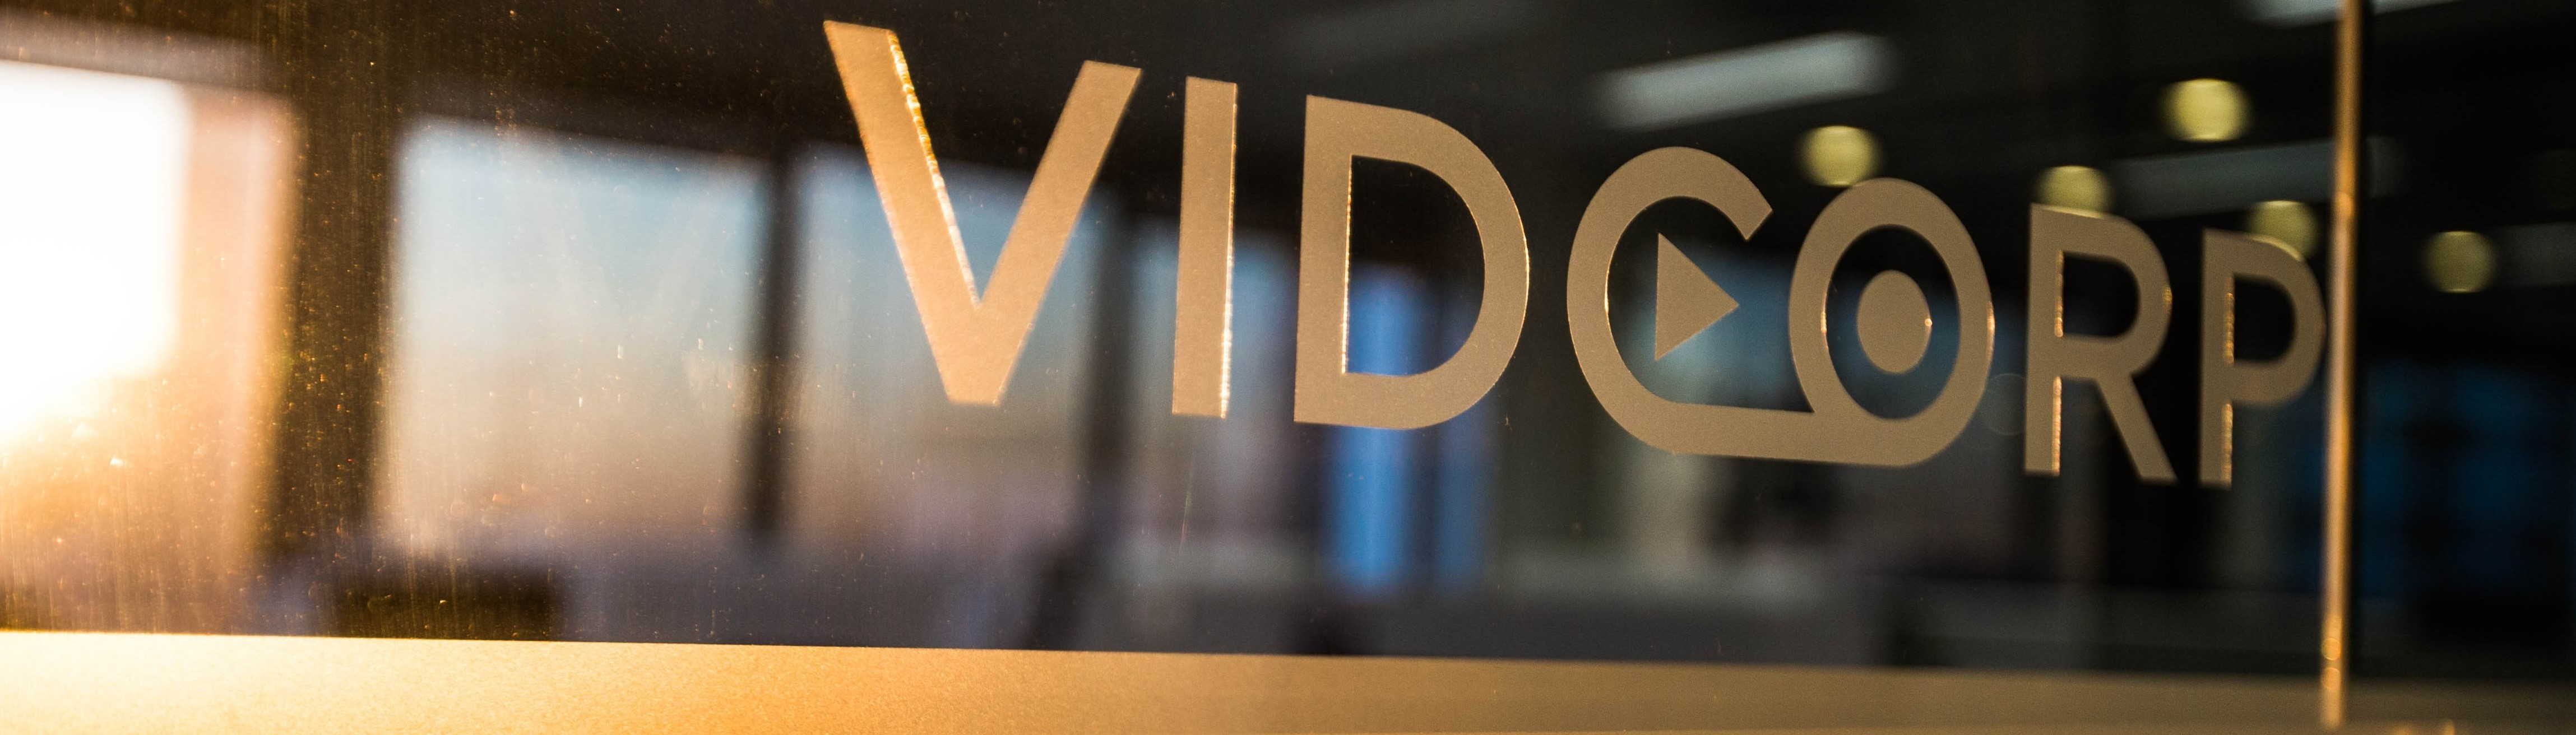 VidCorp logo on glass